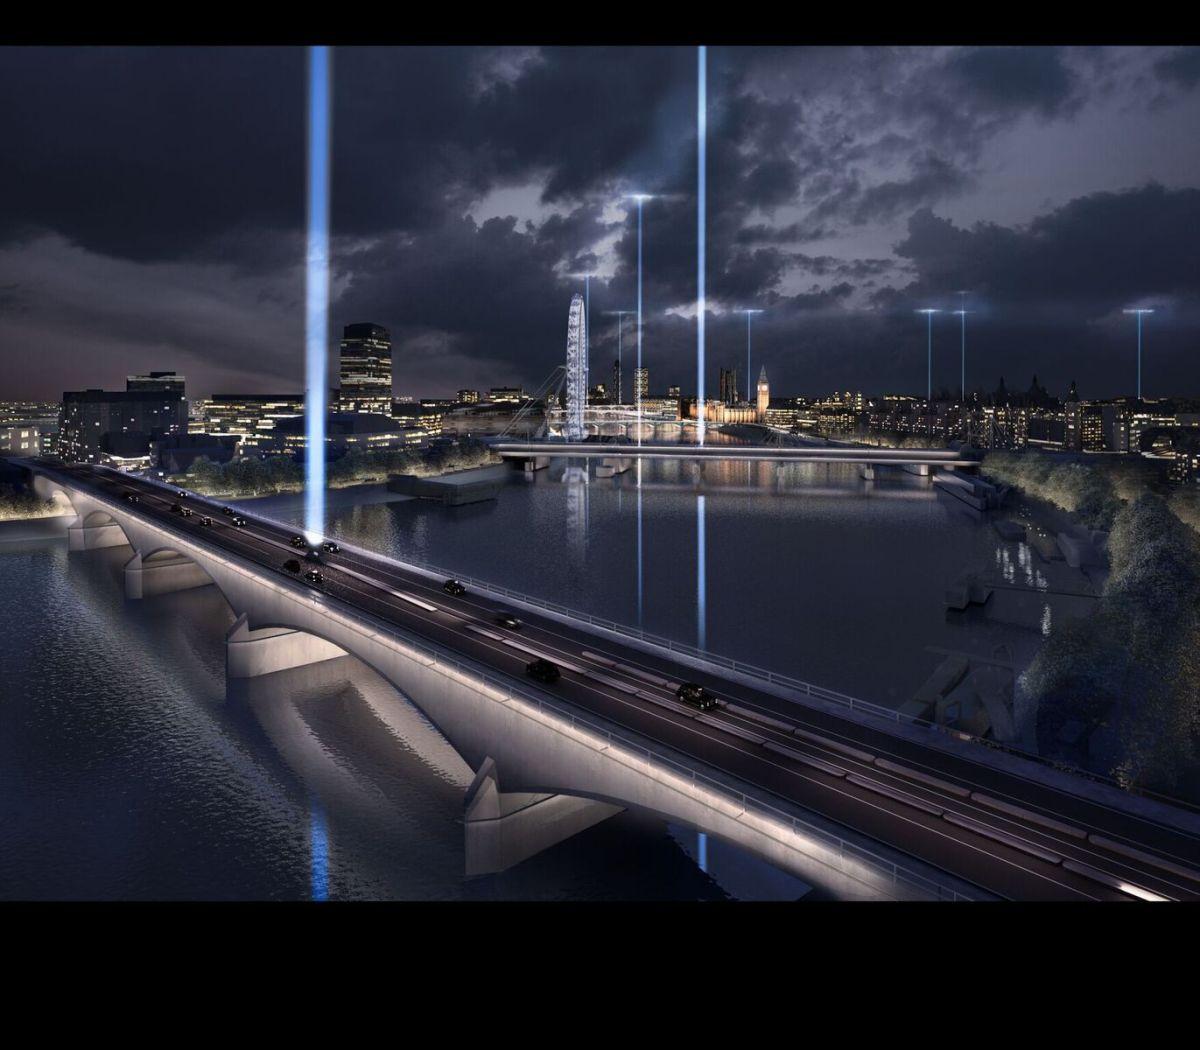 Saluer la nuit - Waterloo Bridge, London, UK © MRC and Diller Scofidio + Renfro